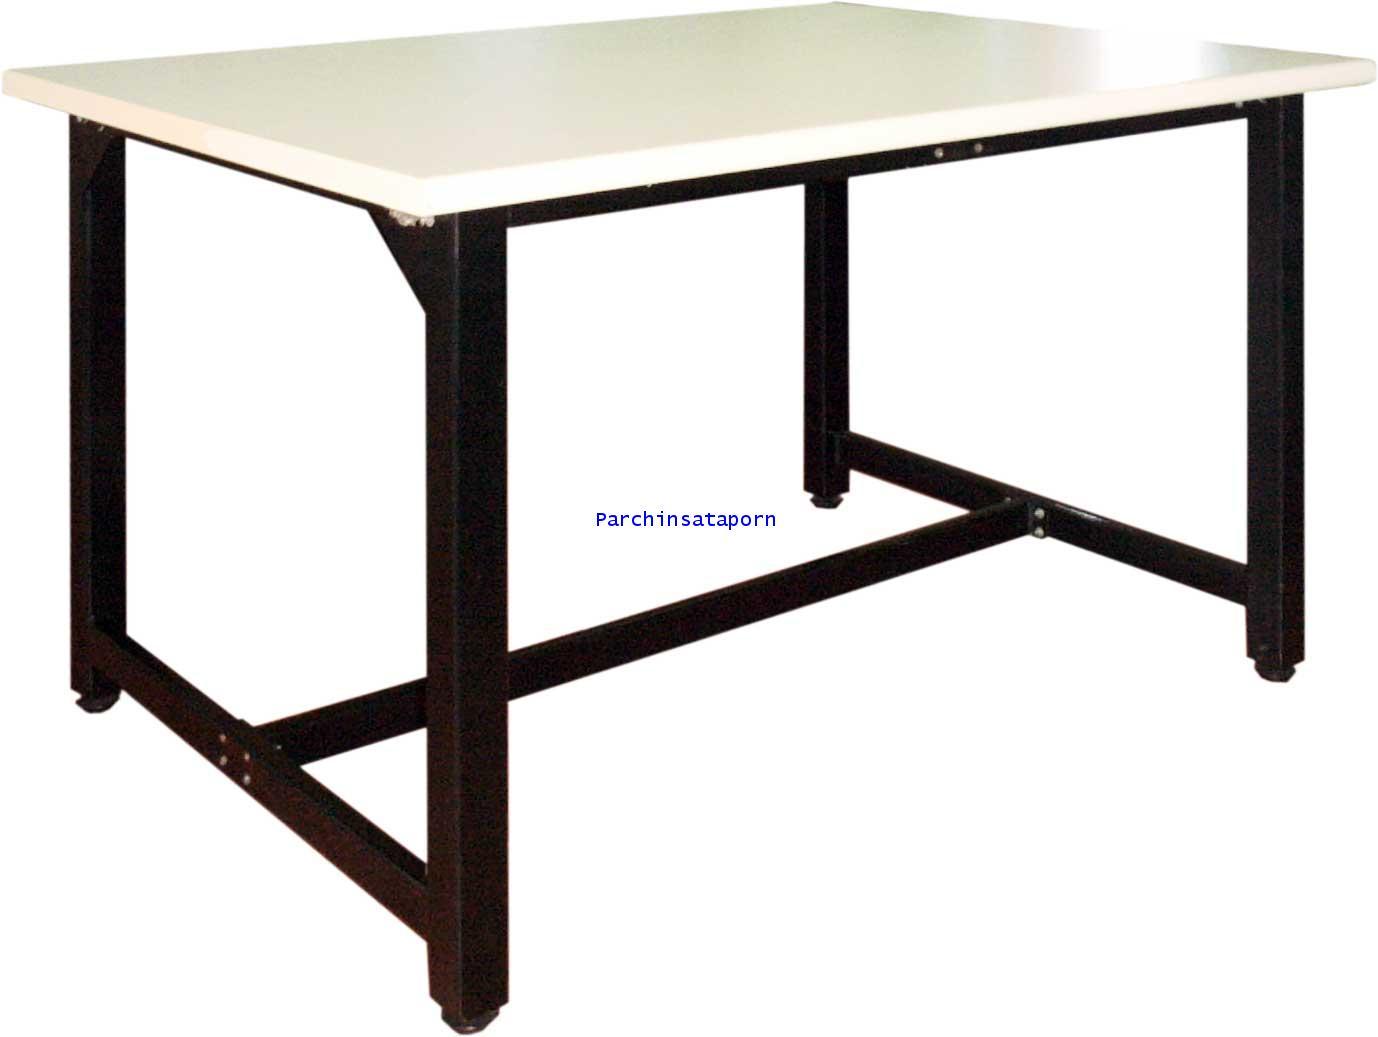 S13 โต๊ะปฎิบัติการ